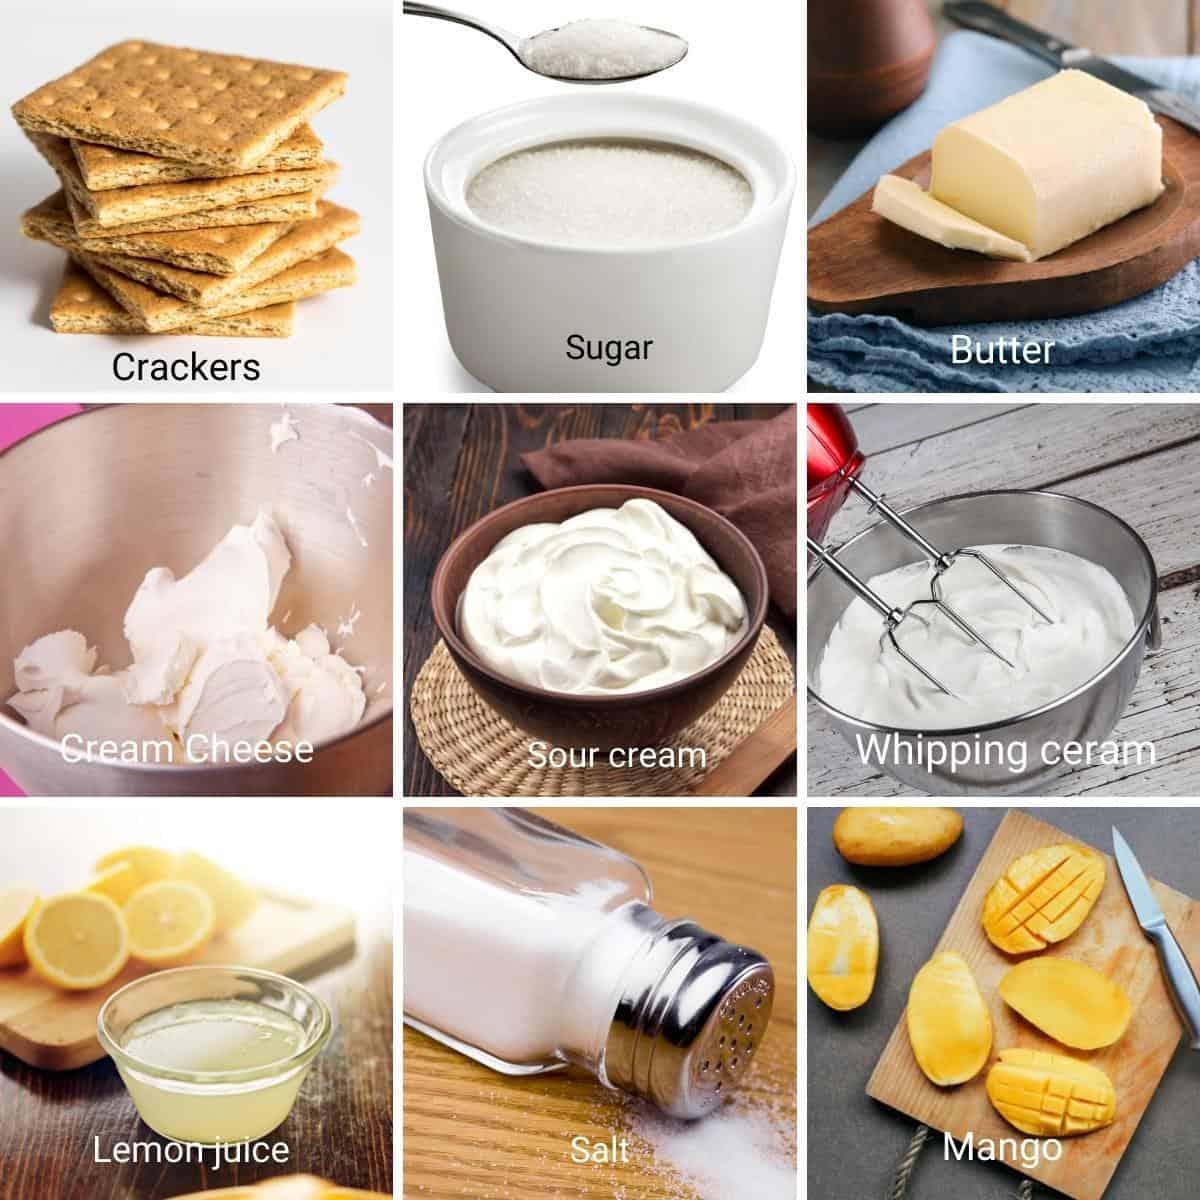 Ingredients shot collage for mango chesecake.